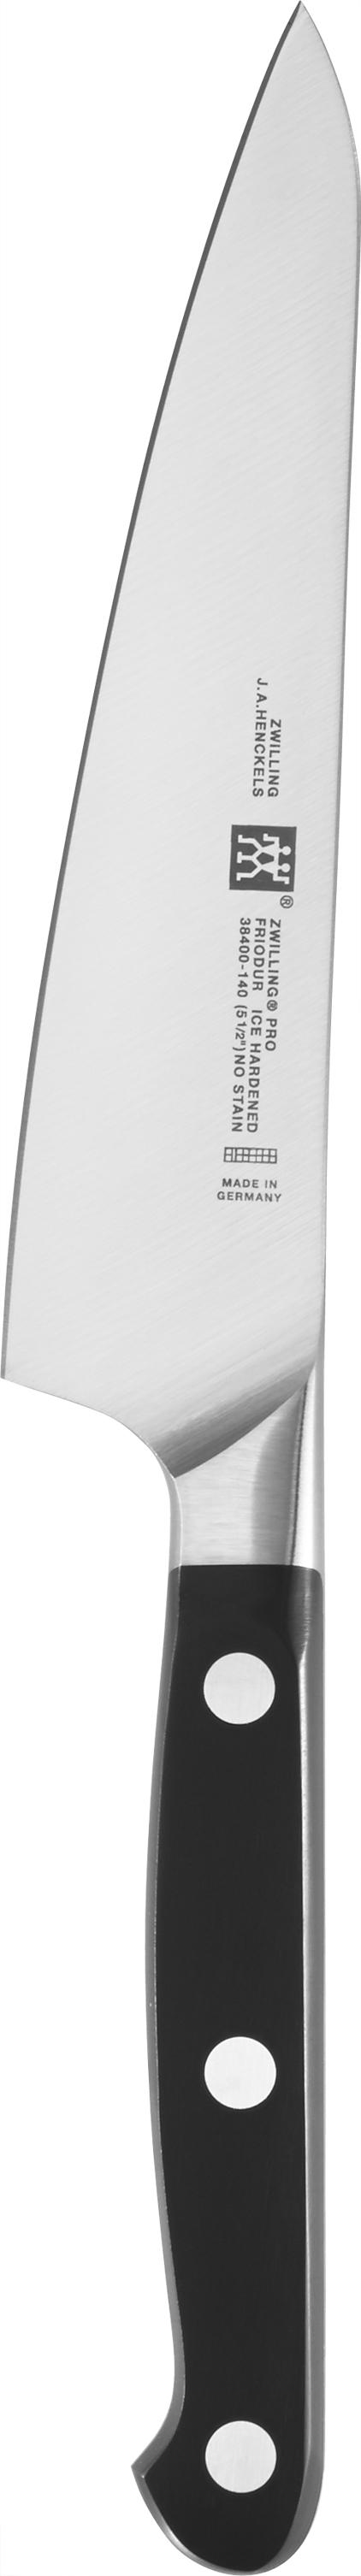 Zwilling Pro Compact Kockkniv 14 cm